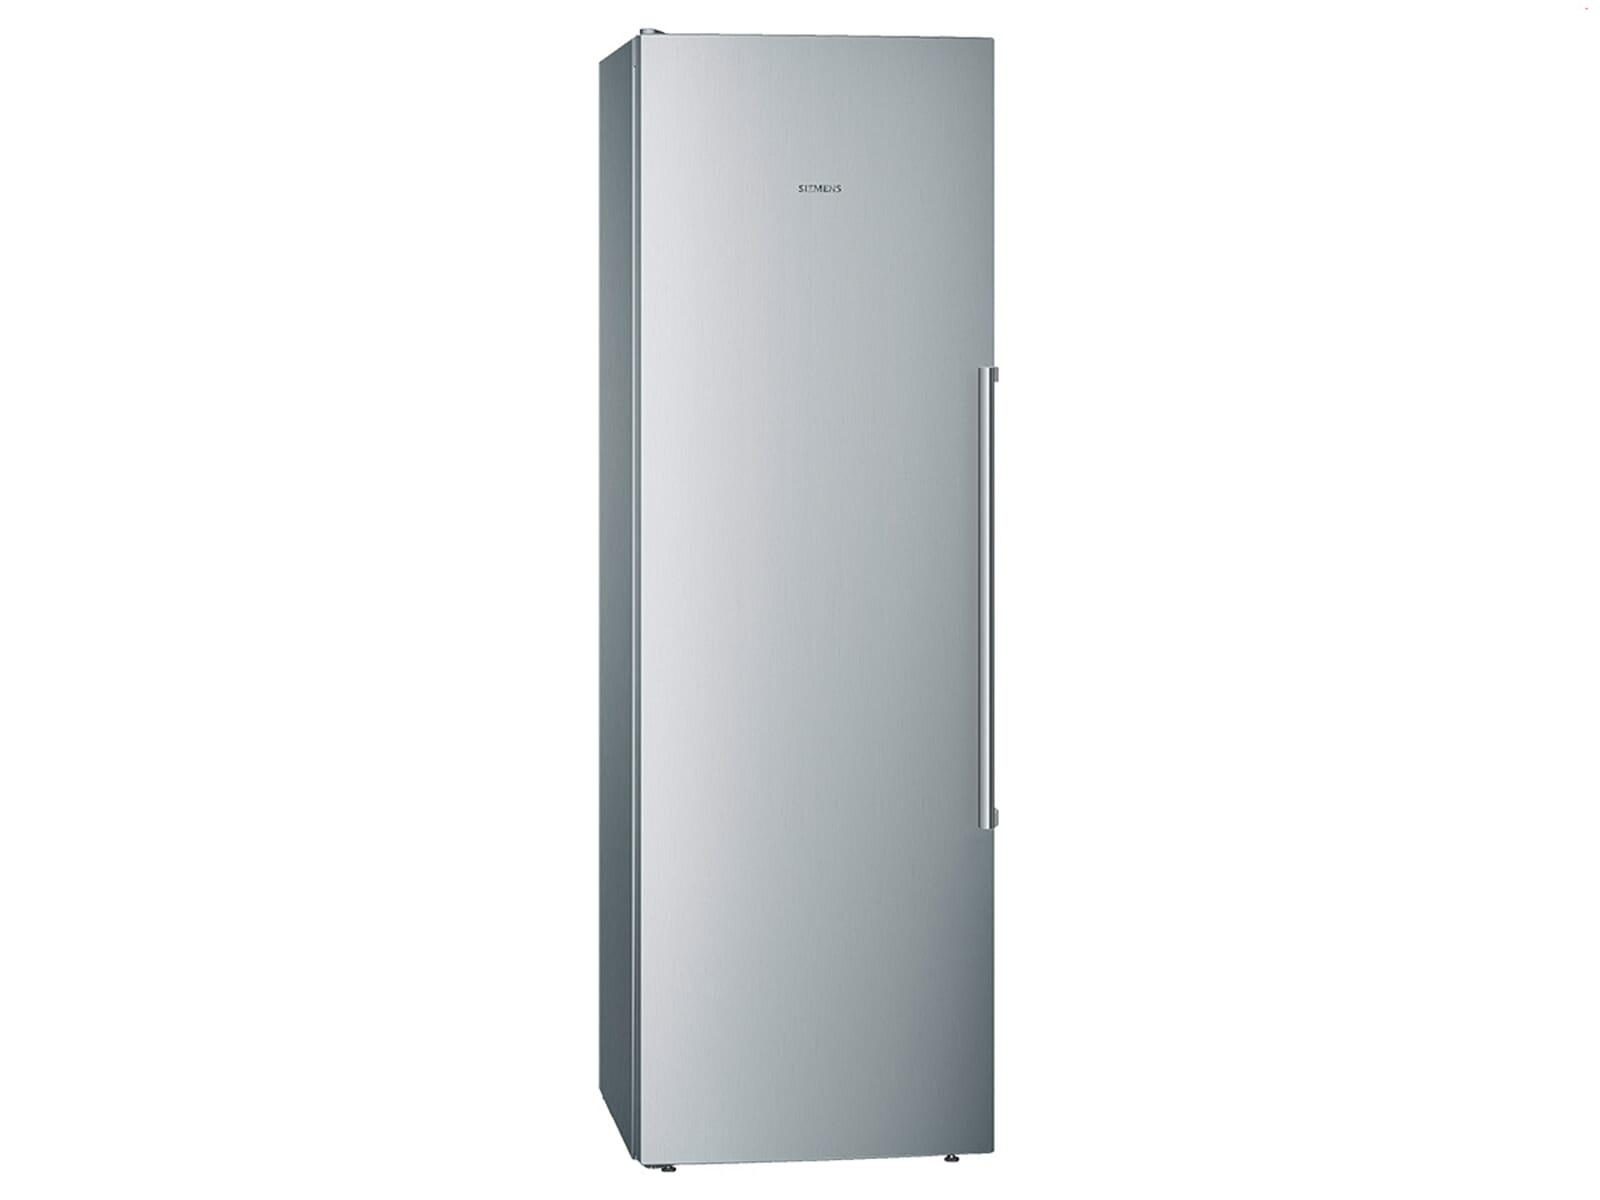 Bosch Kühlschrank Roter Knopf : Siemens kühlschrank roter knopf fehlercode bei siemens bosch neff